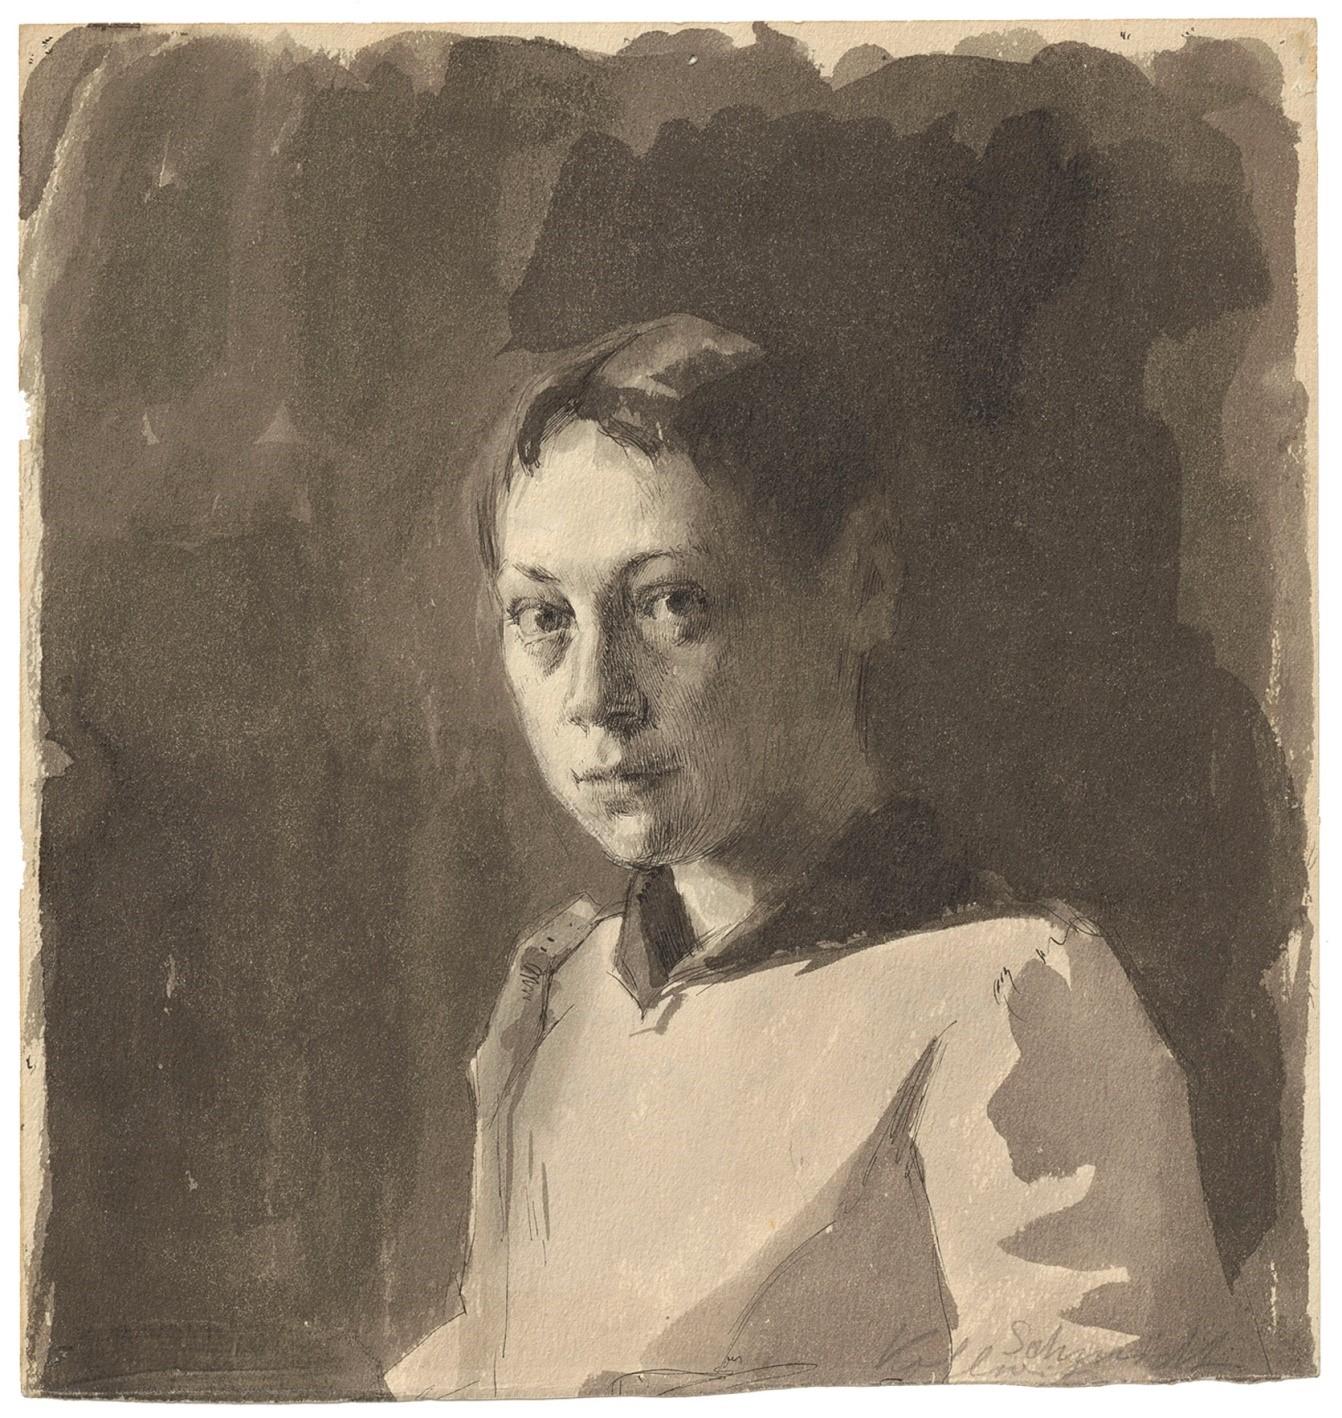 Käthe Kollwitz, Selbstbildnis (Ausschnitt), Feder und Pinsel in Sepia, um 1888, Nachlass Marianne Fiedler. © Käthe Kollwitz Museum Köln